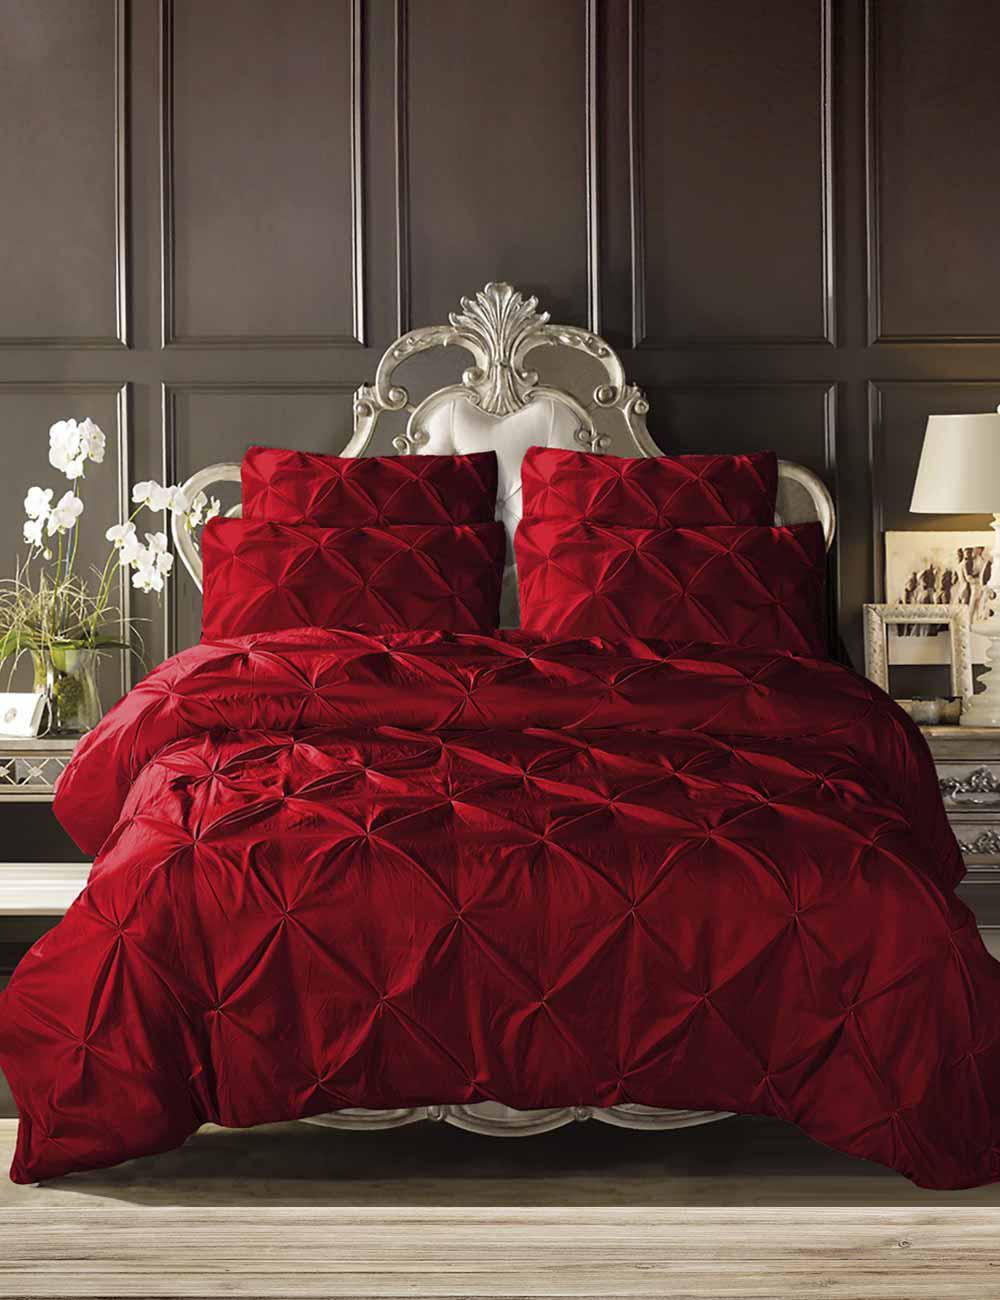 bettw sche pluma 135 x 170 cm. Black Bedroom Furniture Sets. Home Design Ideas